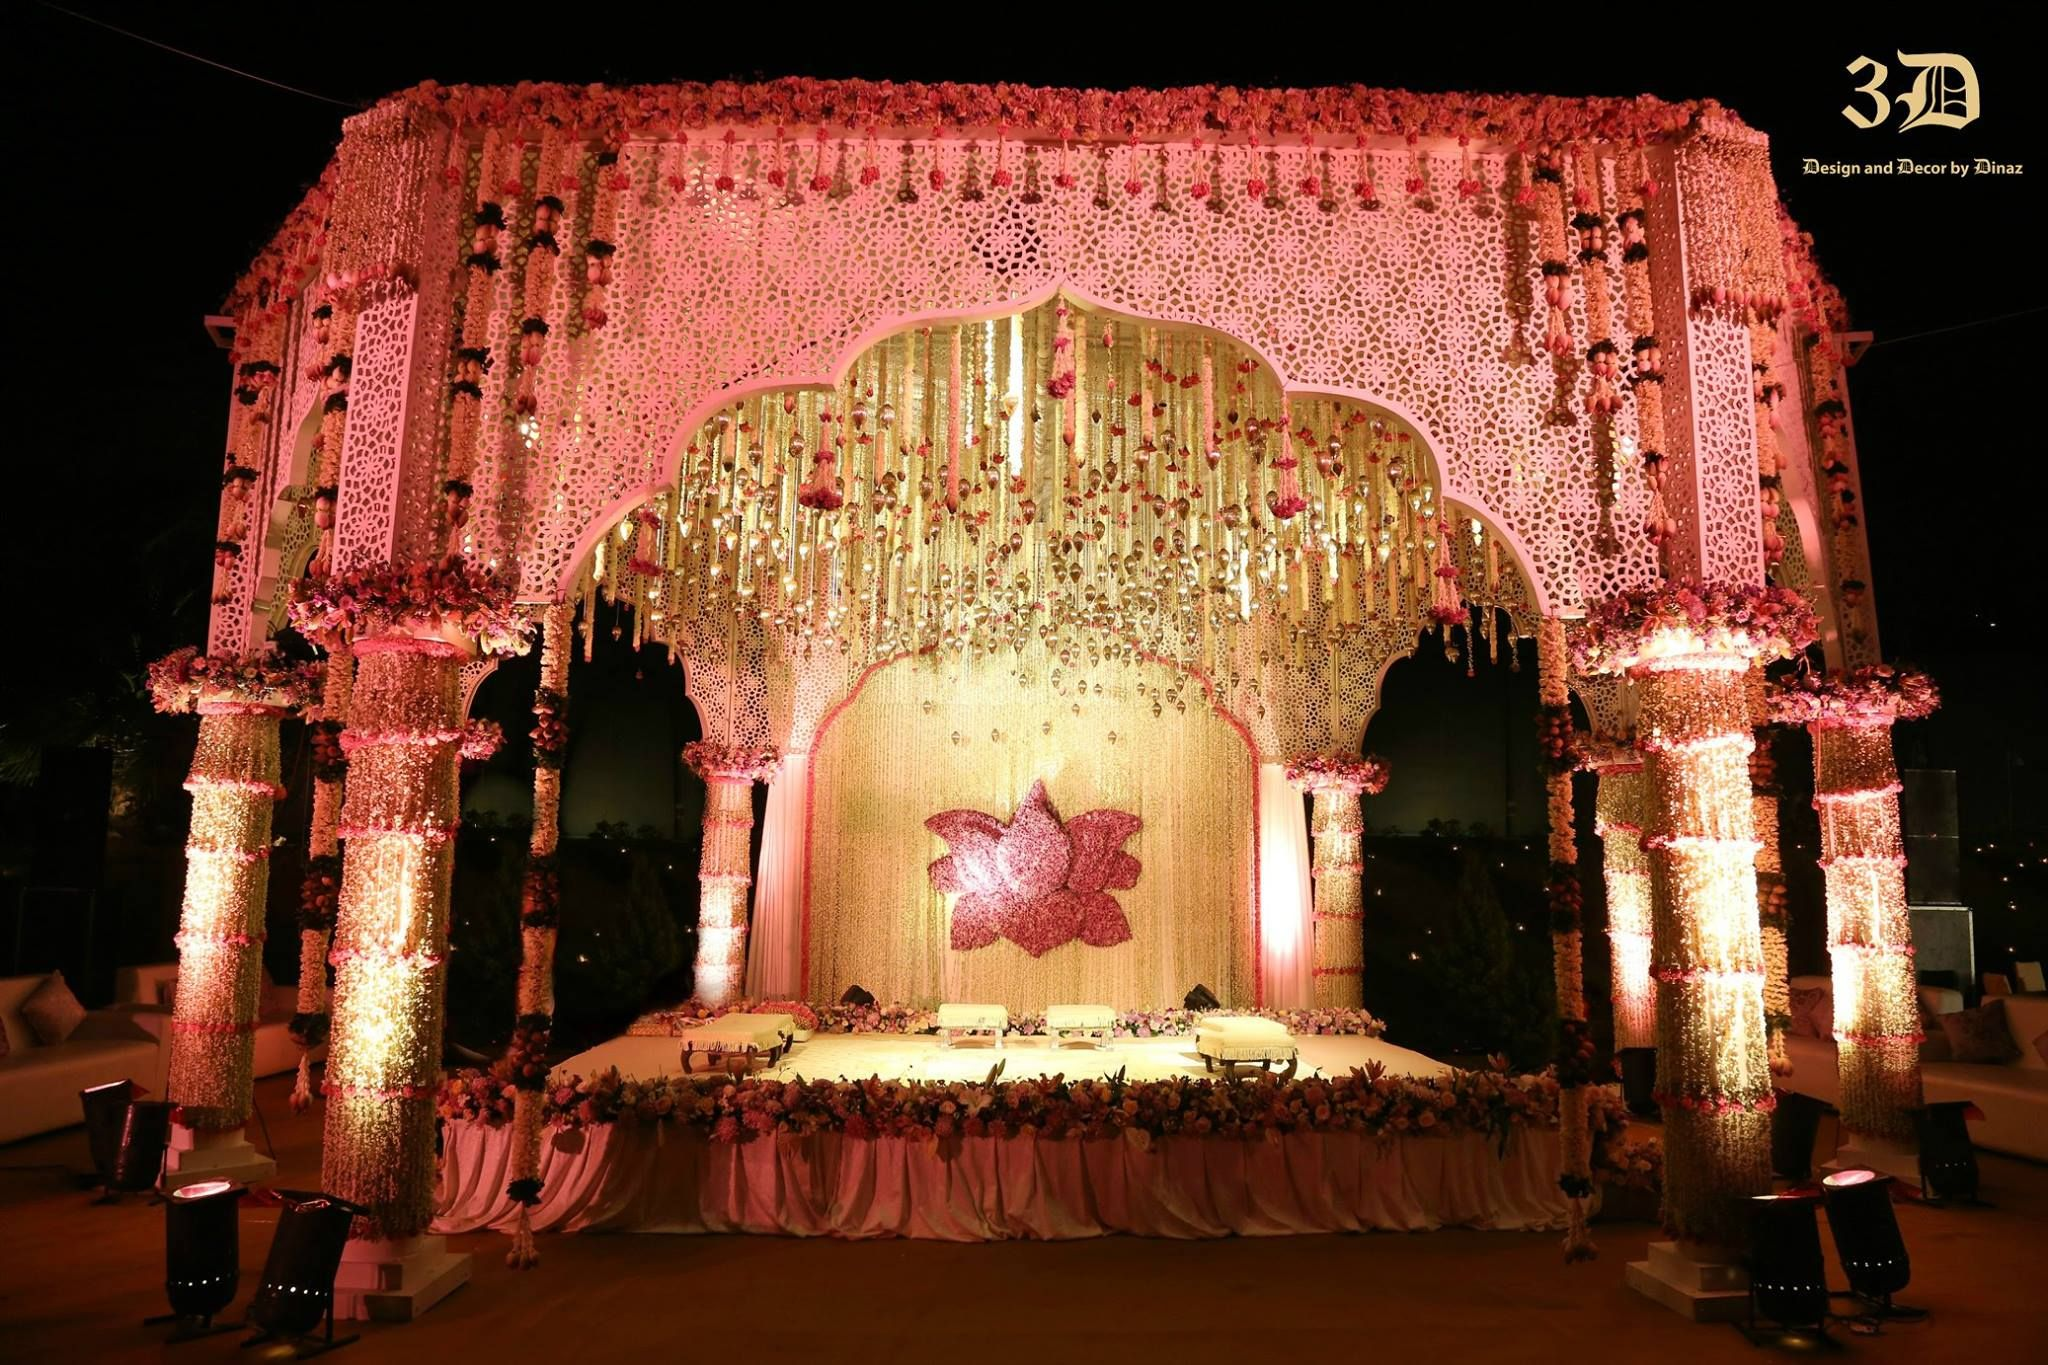 Wedding night decoration ideas  Pin by Dhinesh R on wedding  Pinterest  Wedding